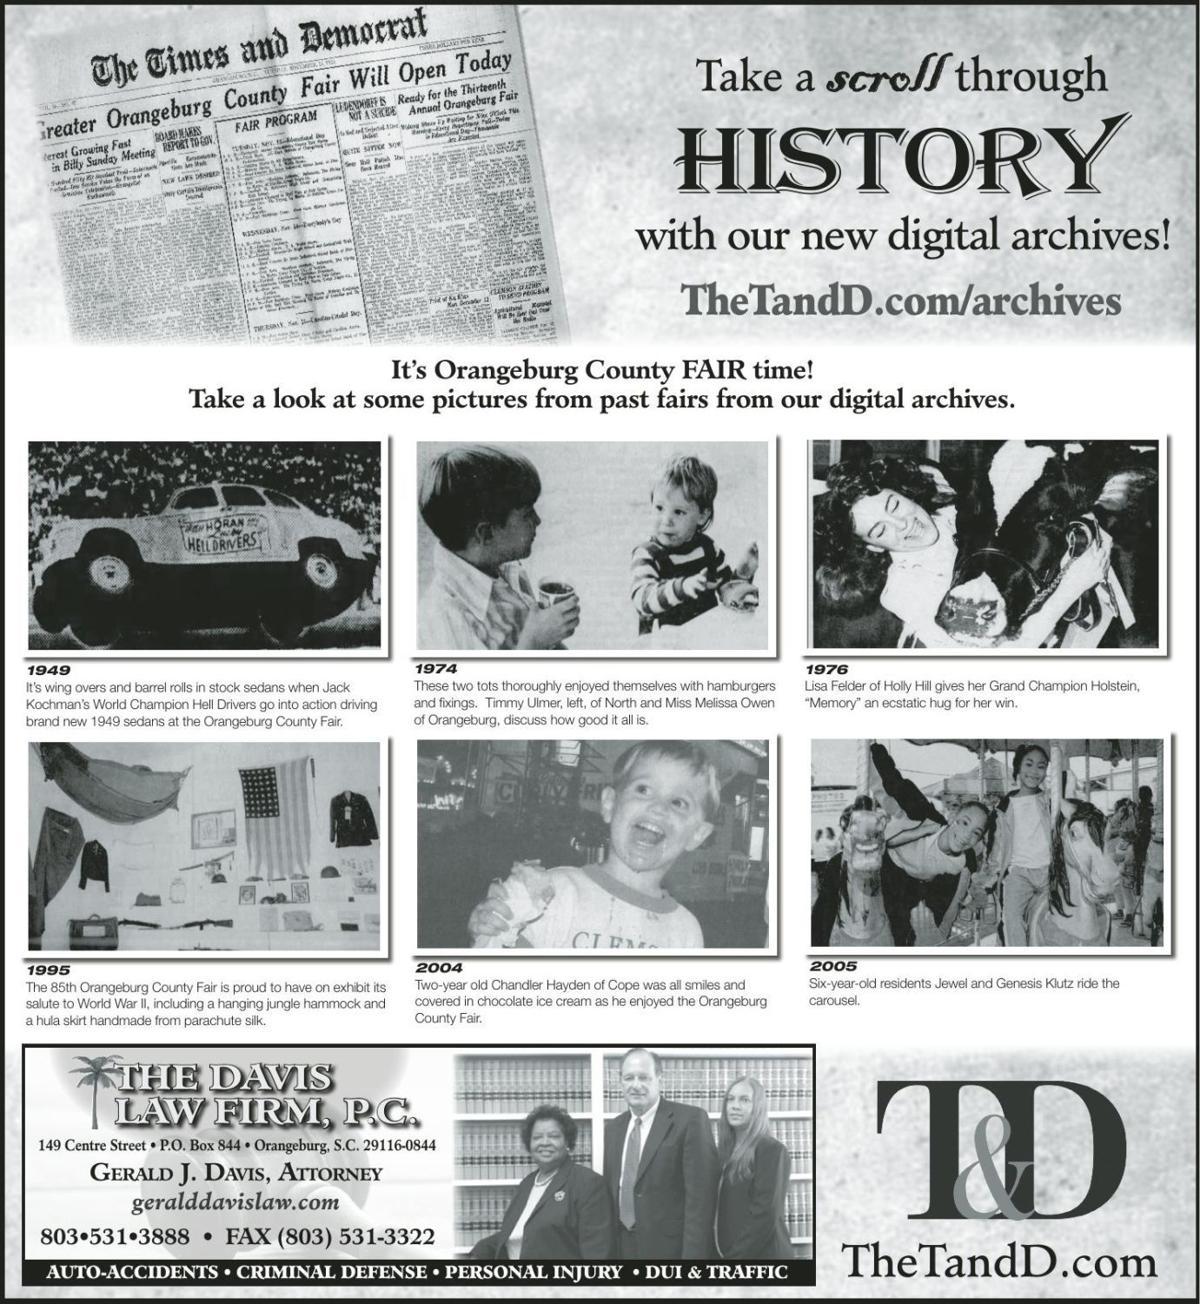 TheTandD.com/archives Sept. 29, 2019